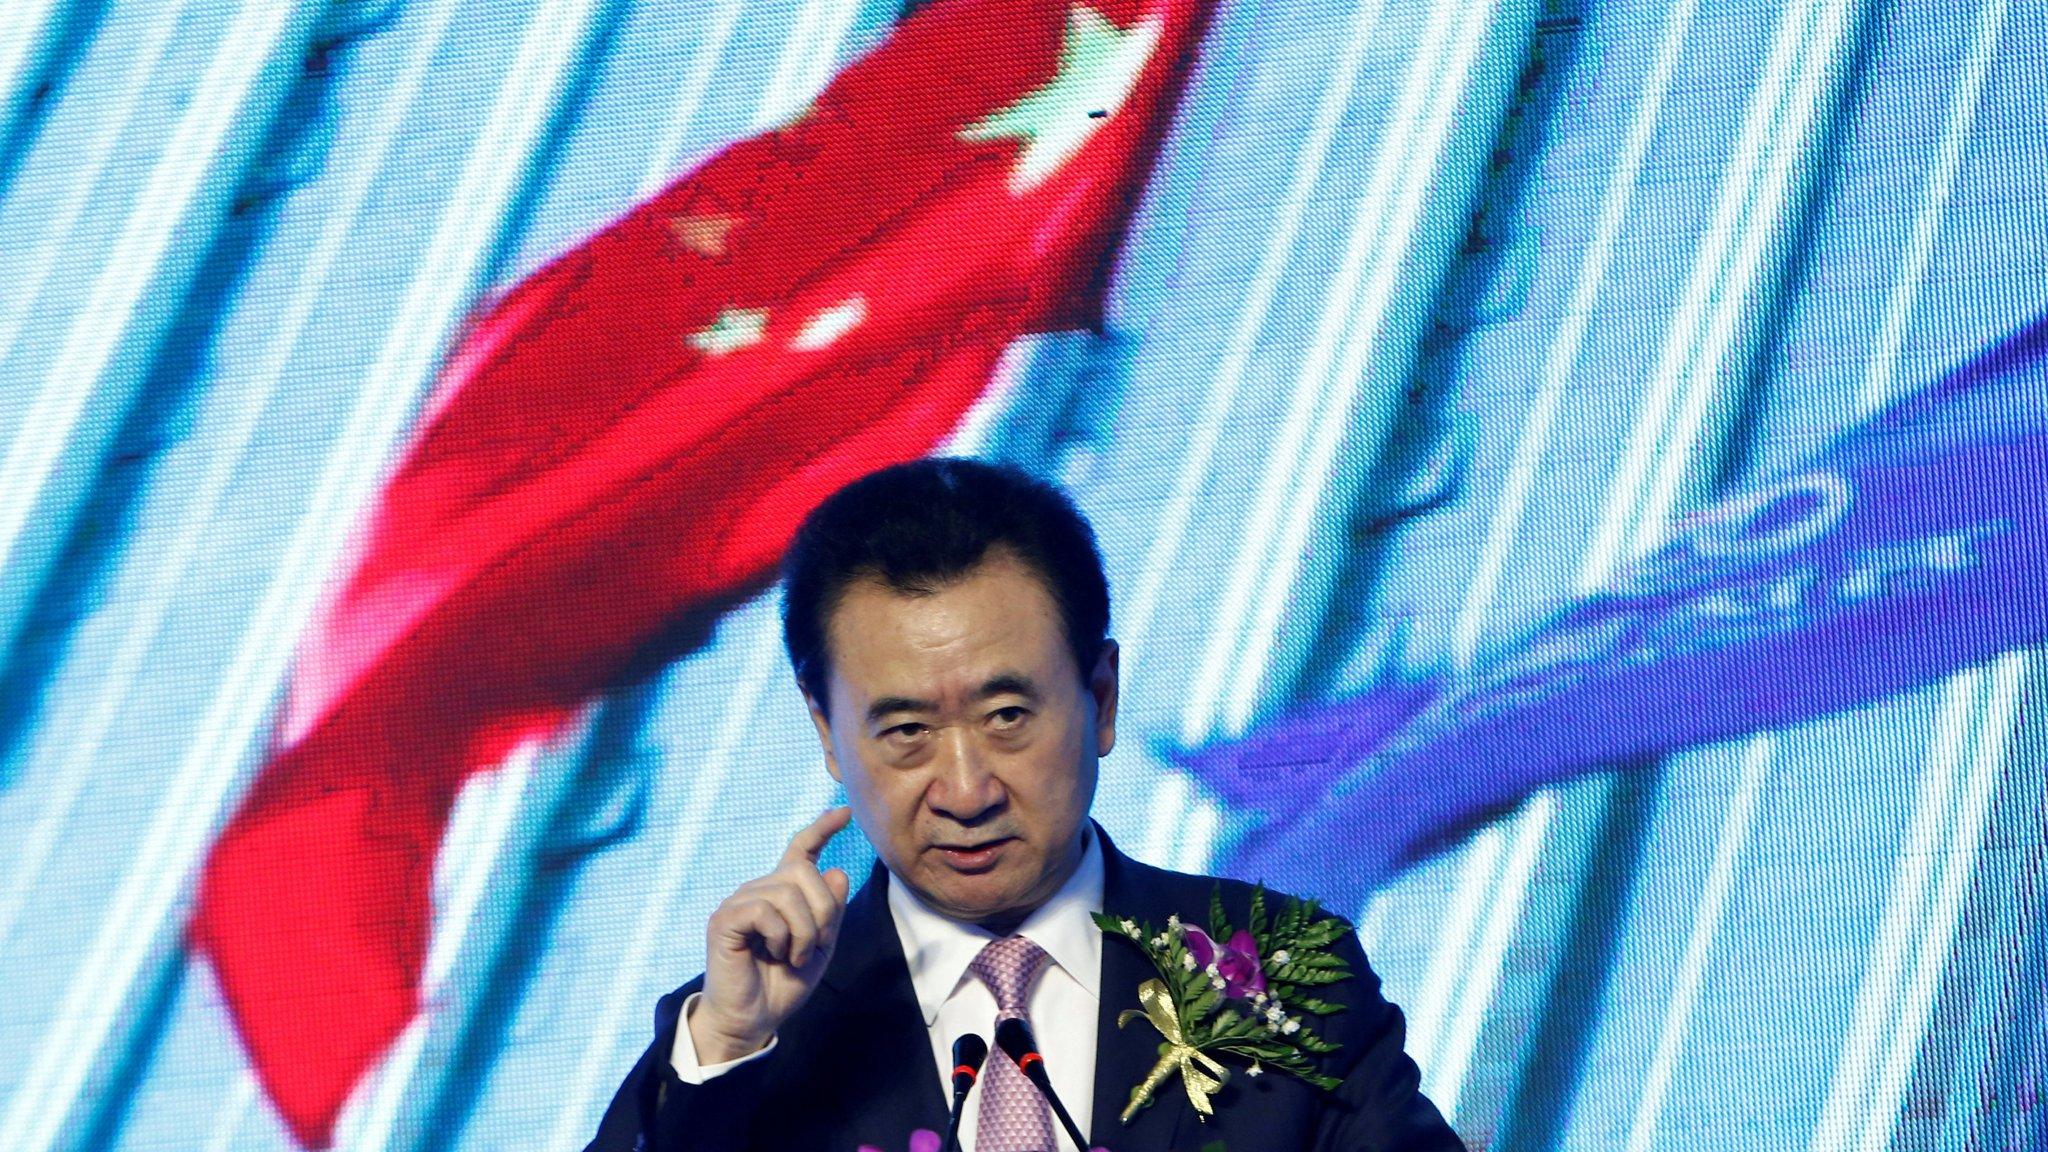 Dalian Wanda pledges to clear overseas debt as revenues drop